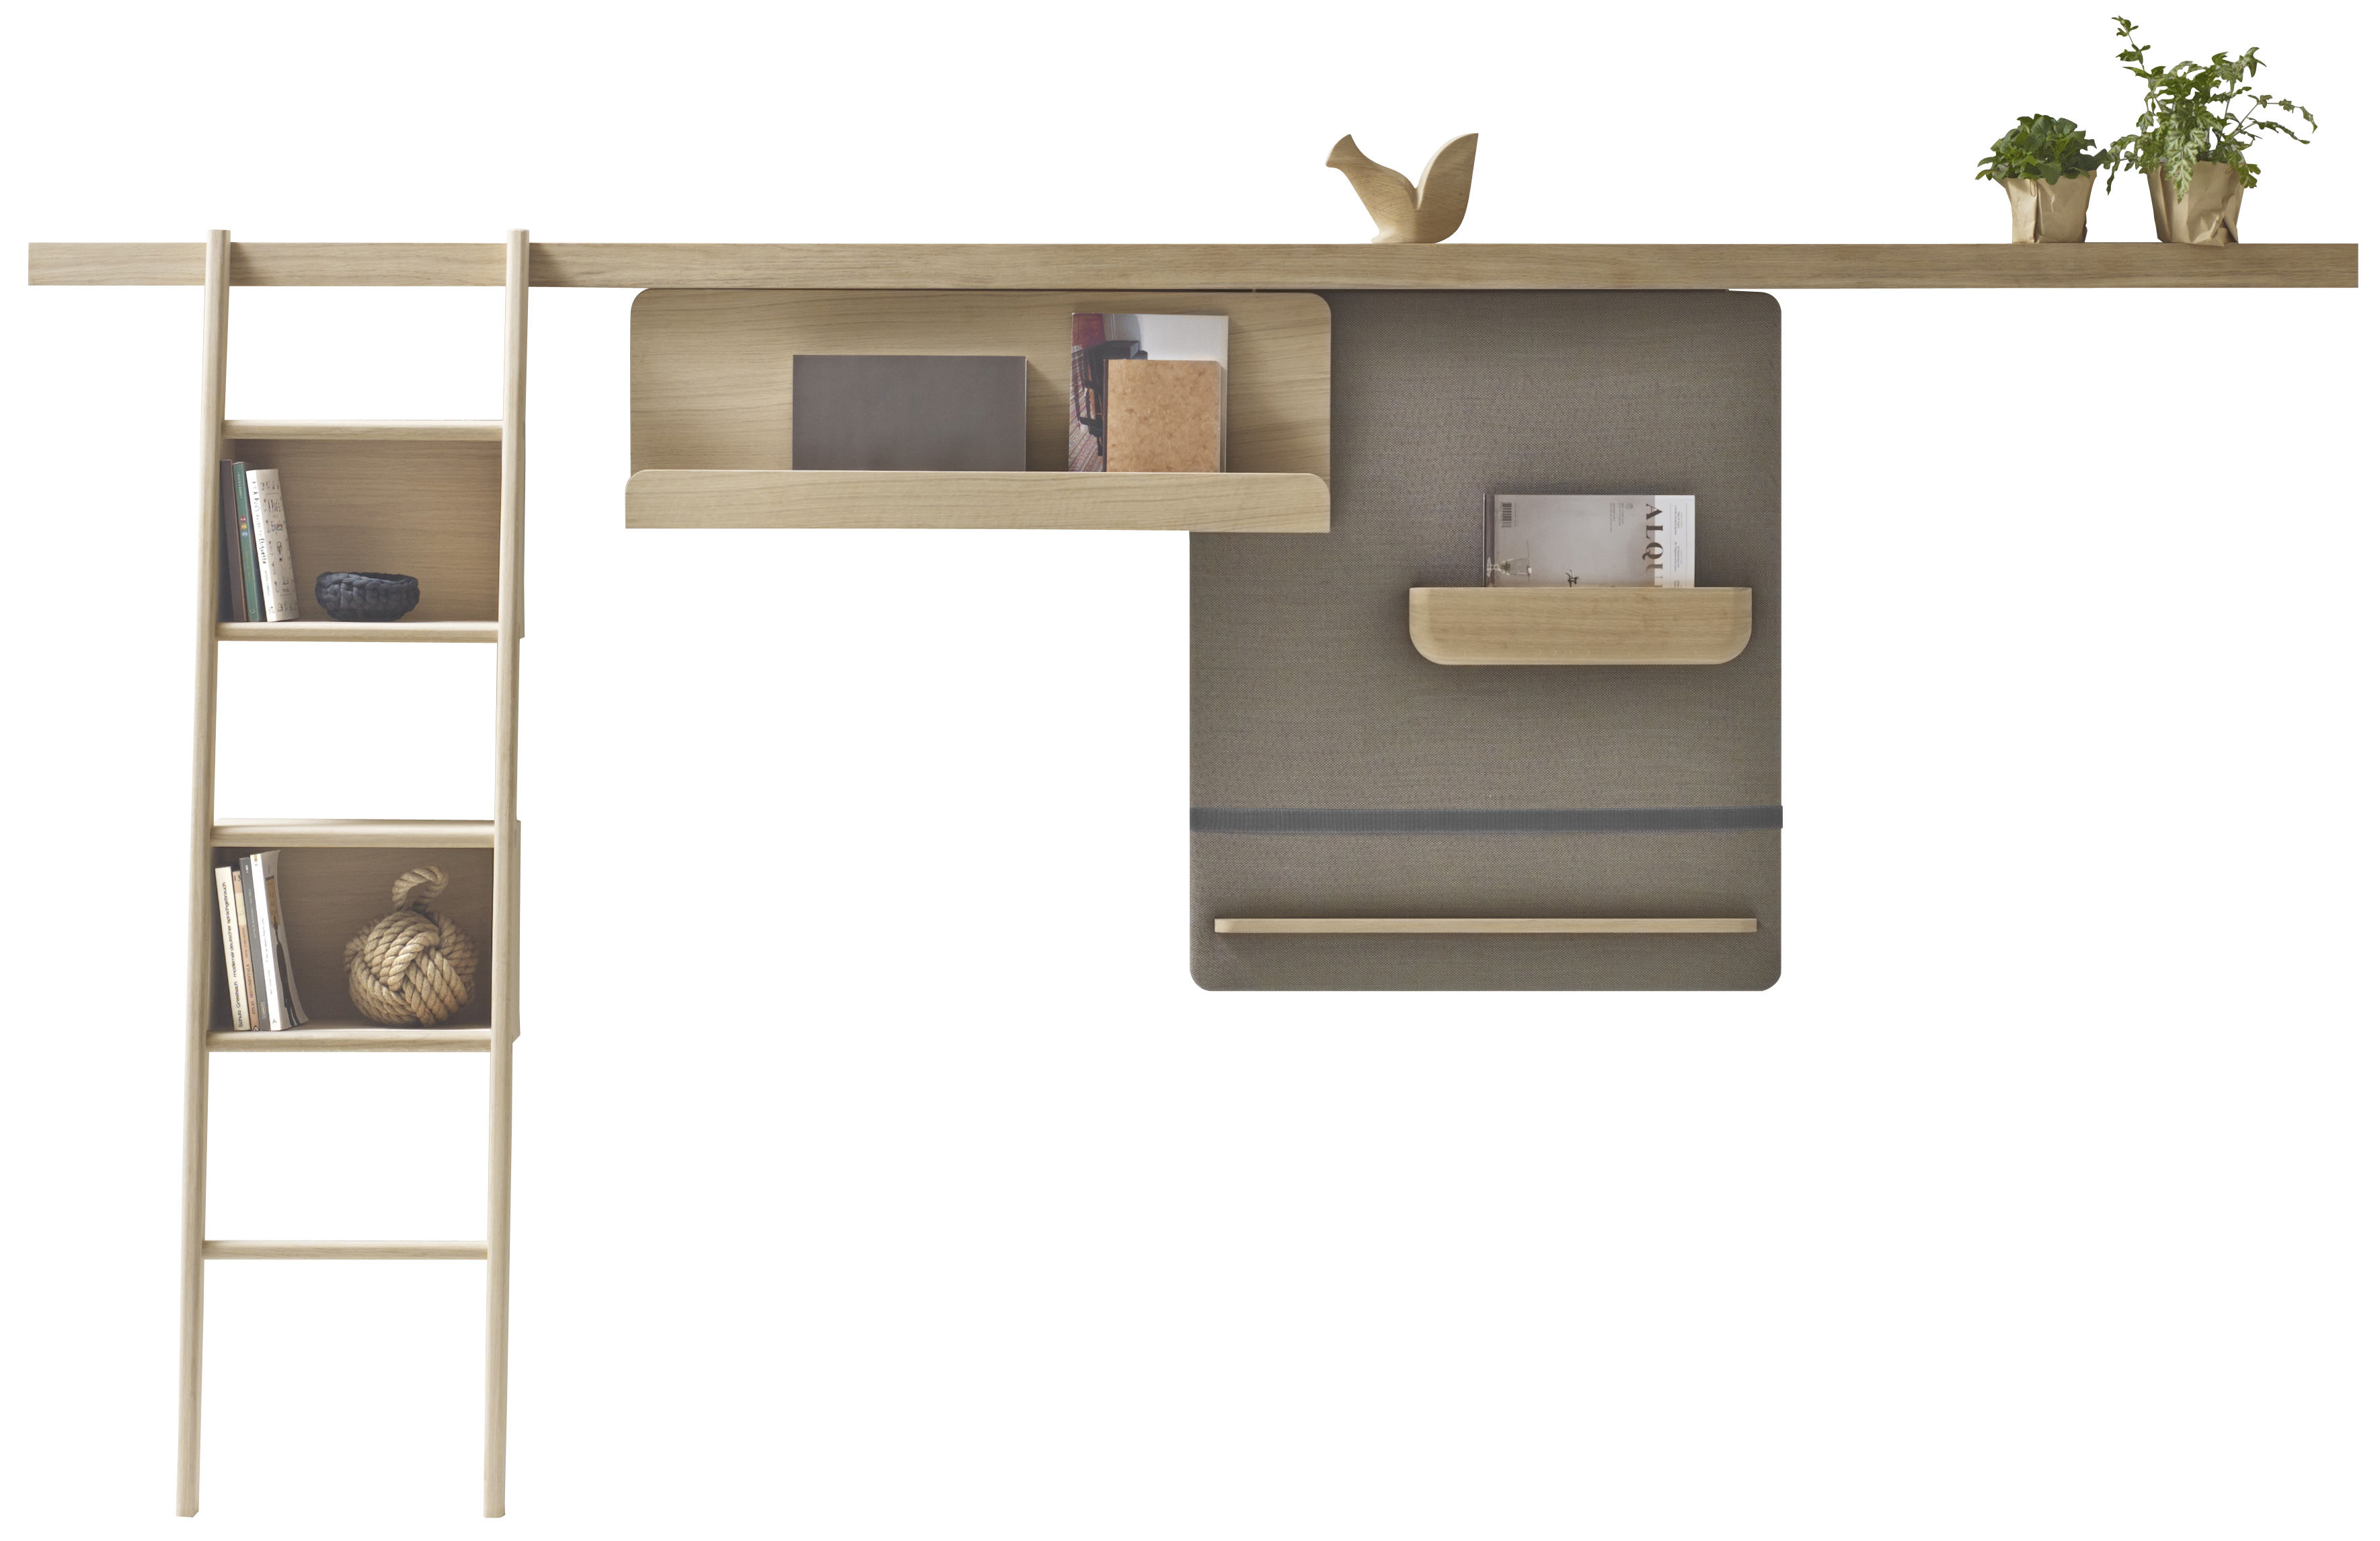 rangement mural zutik 3 accessoires modulables l 300. Black Bedroom Furniture Sets. Home Design Ideas